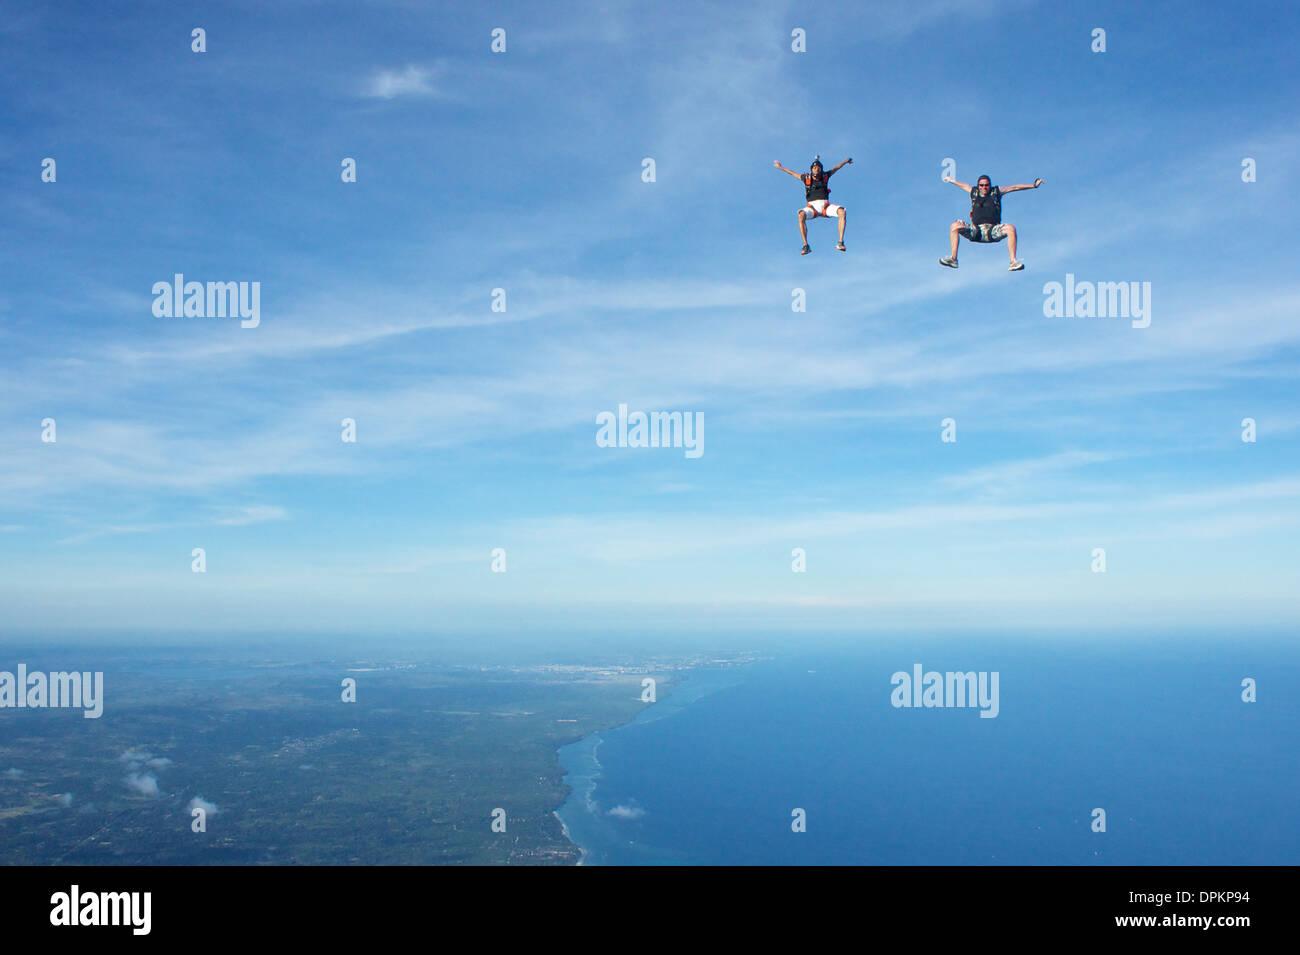 Skydivers freeflying over Diani Beach, Kenya - Stock Image